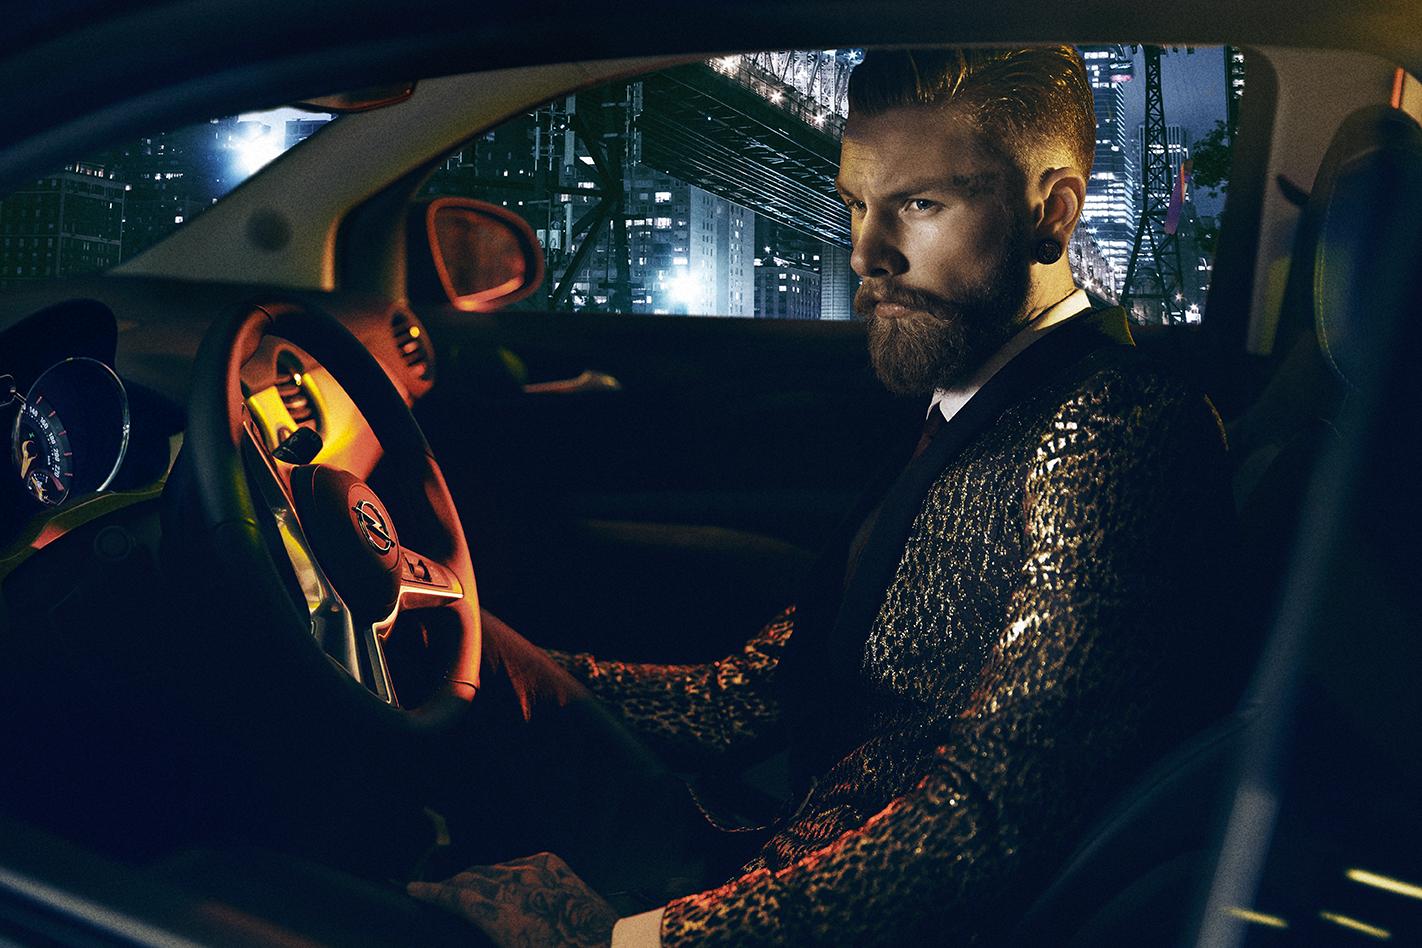 Opel_Adam_GQ_2014_6.png